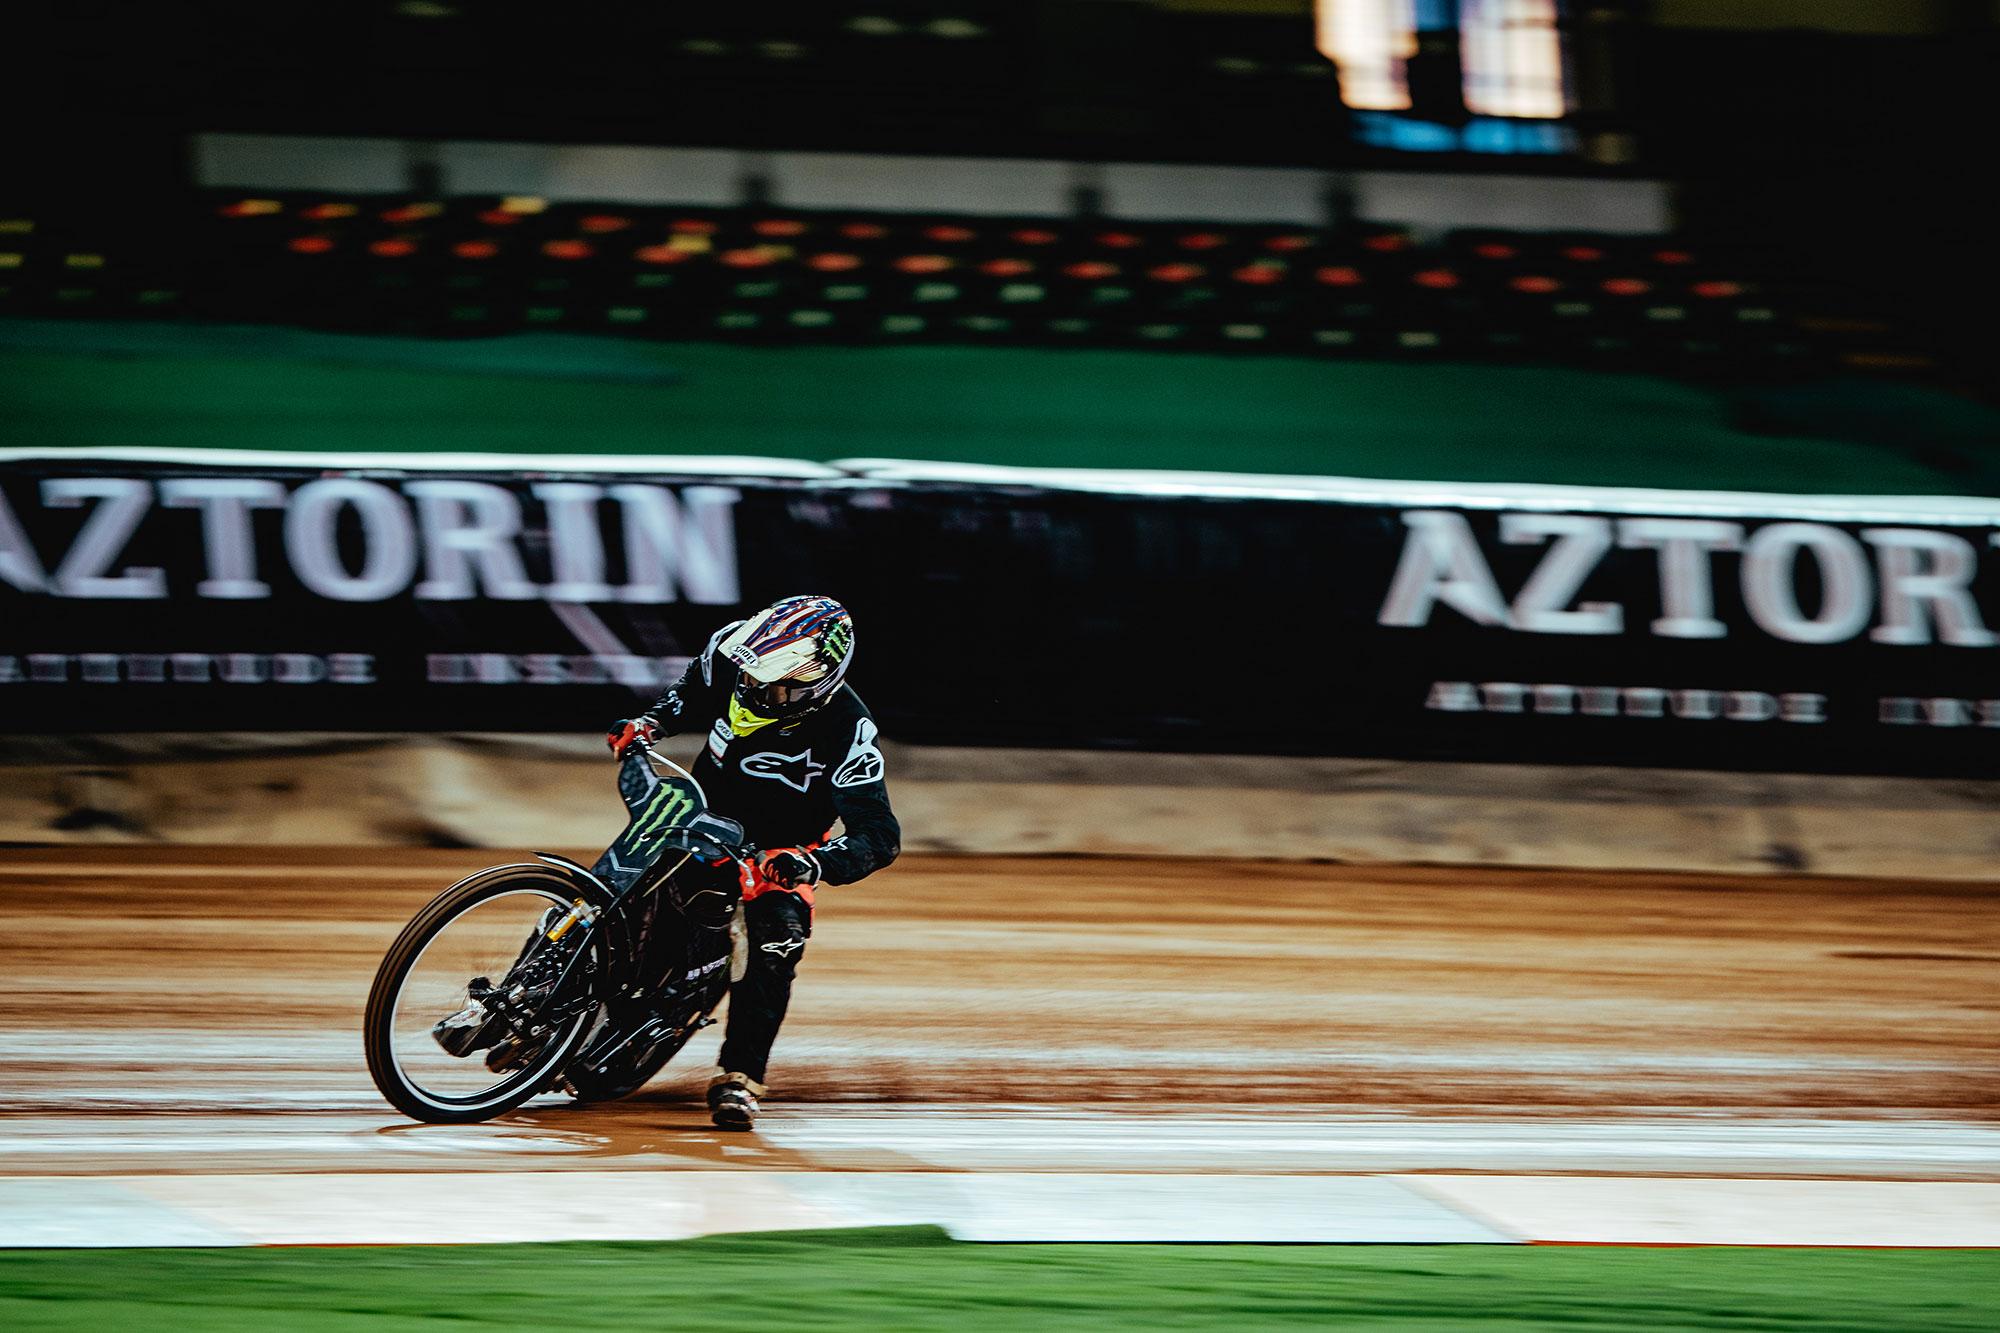 Motorbike Speedway Photography